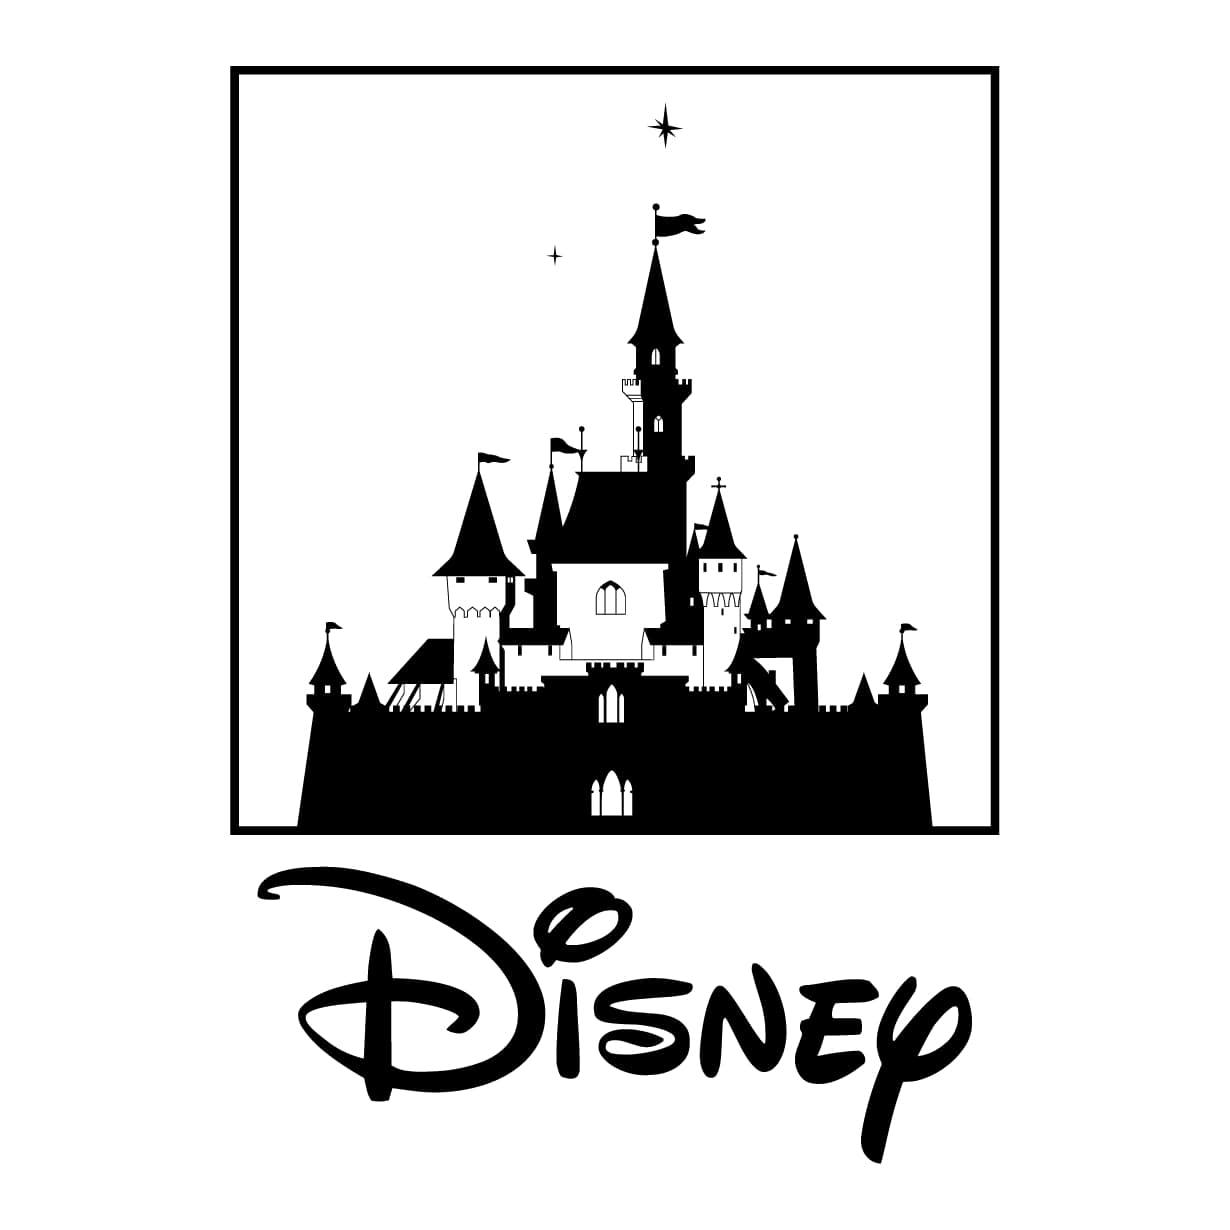 Disney customer service philosophy